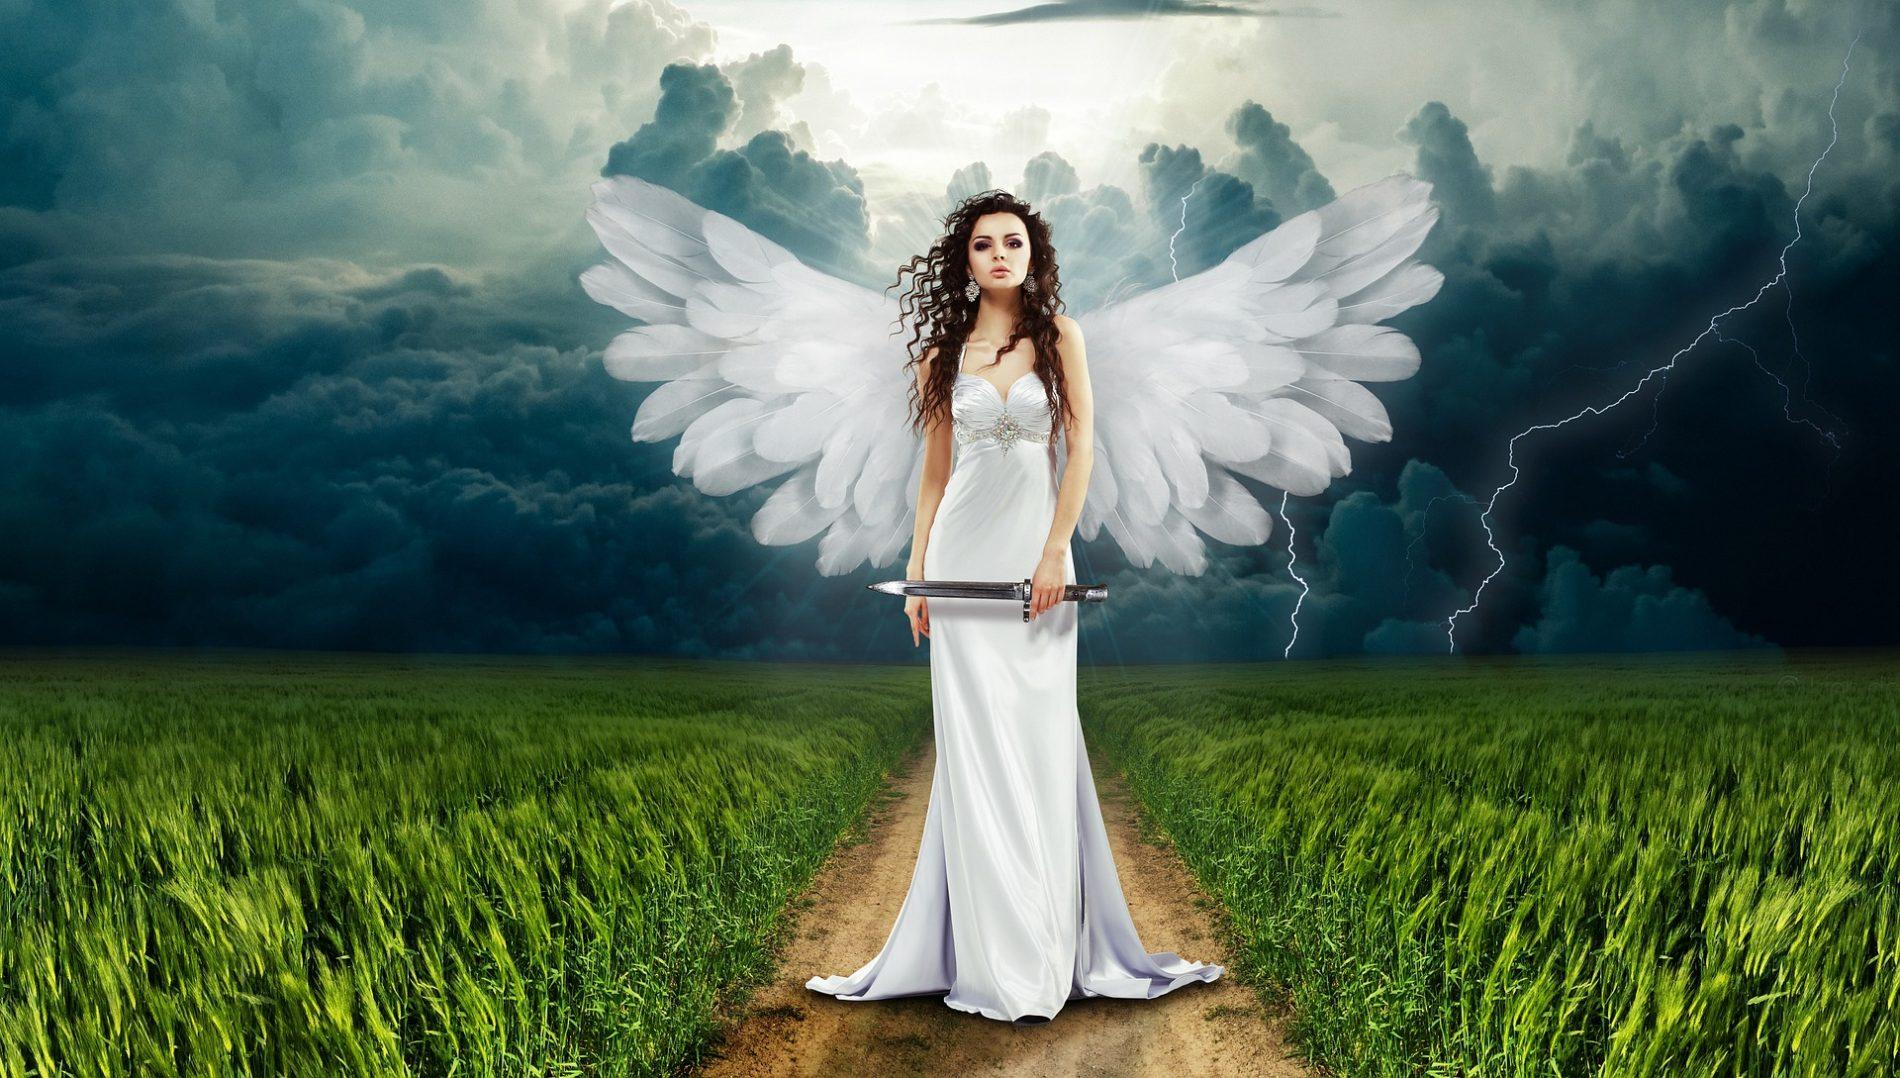 Foto: https://pixabay.com/it/angel-coltello-natura-flash-nubi-749625/